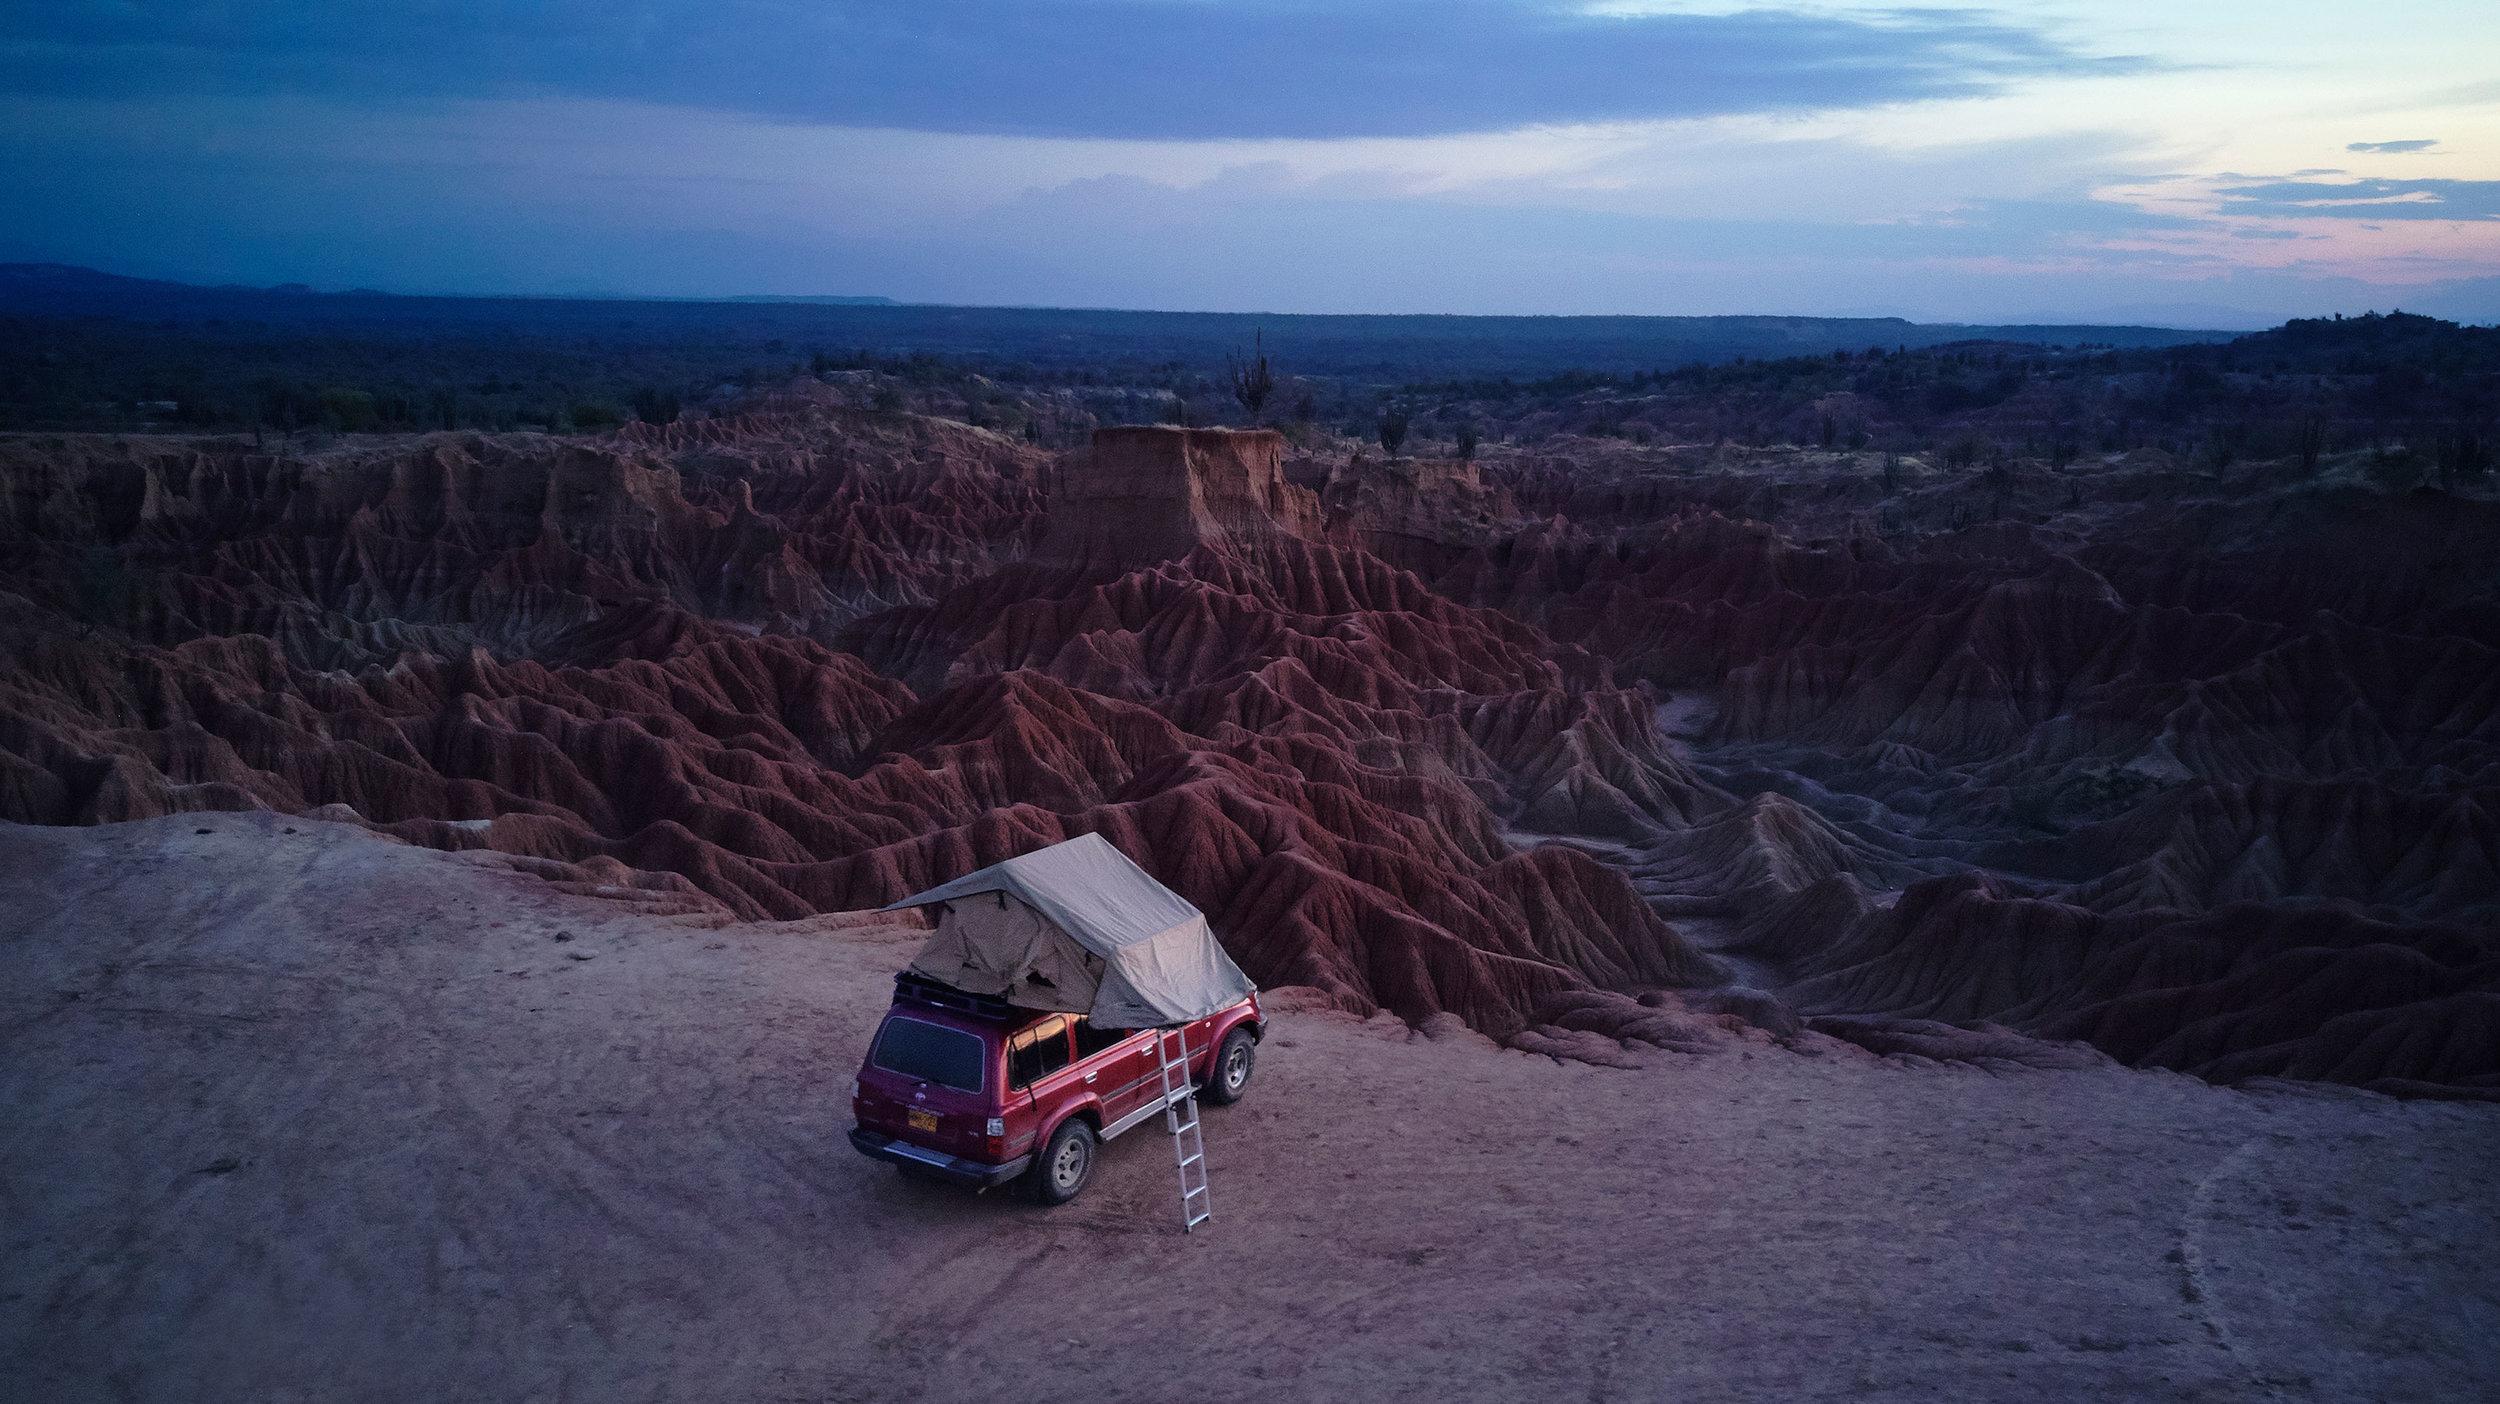 Colombia-travel-Tatacoa-desert-car-rooftop-tent